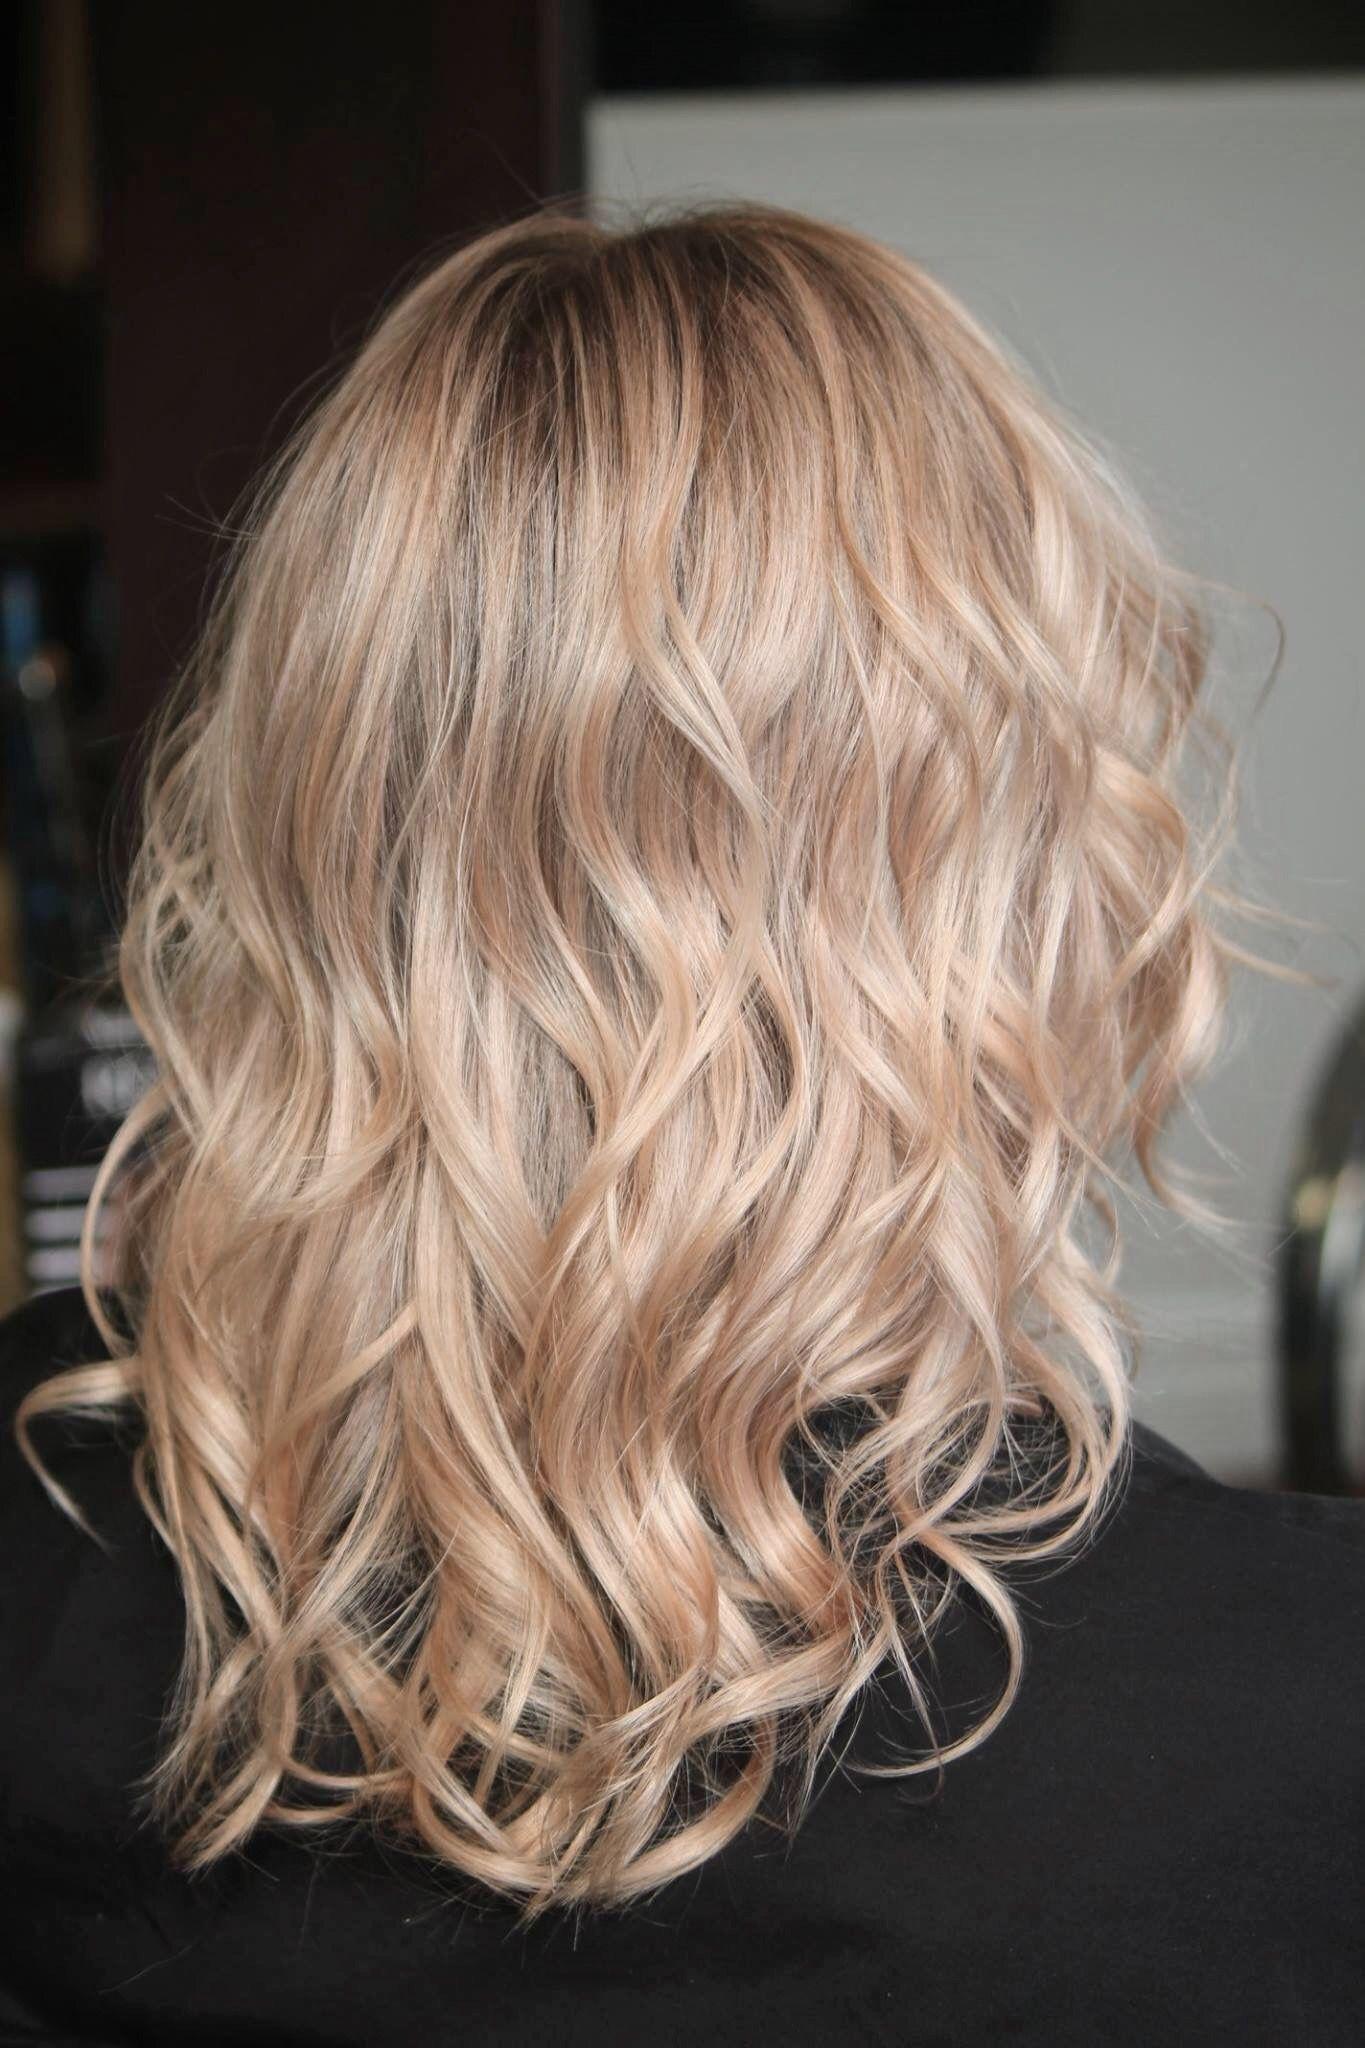 Champagne Rose Balayage Cololabo Conceptjp Hairstyle Rose Pink Hair Styles Long Hair Styles Balayage